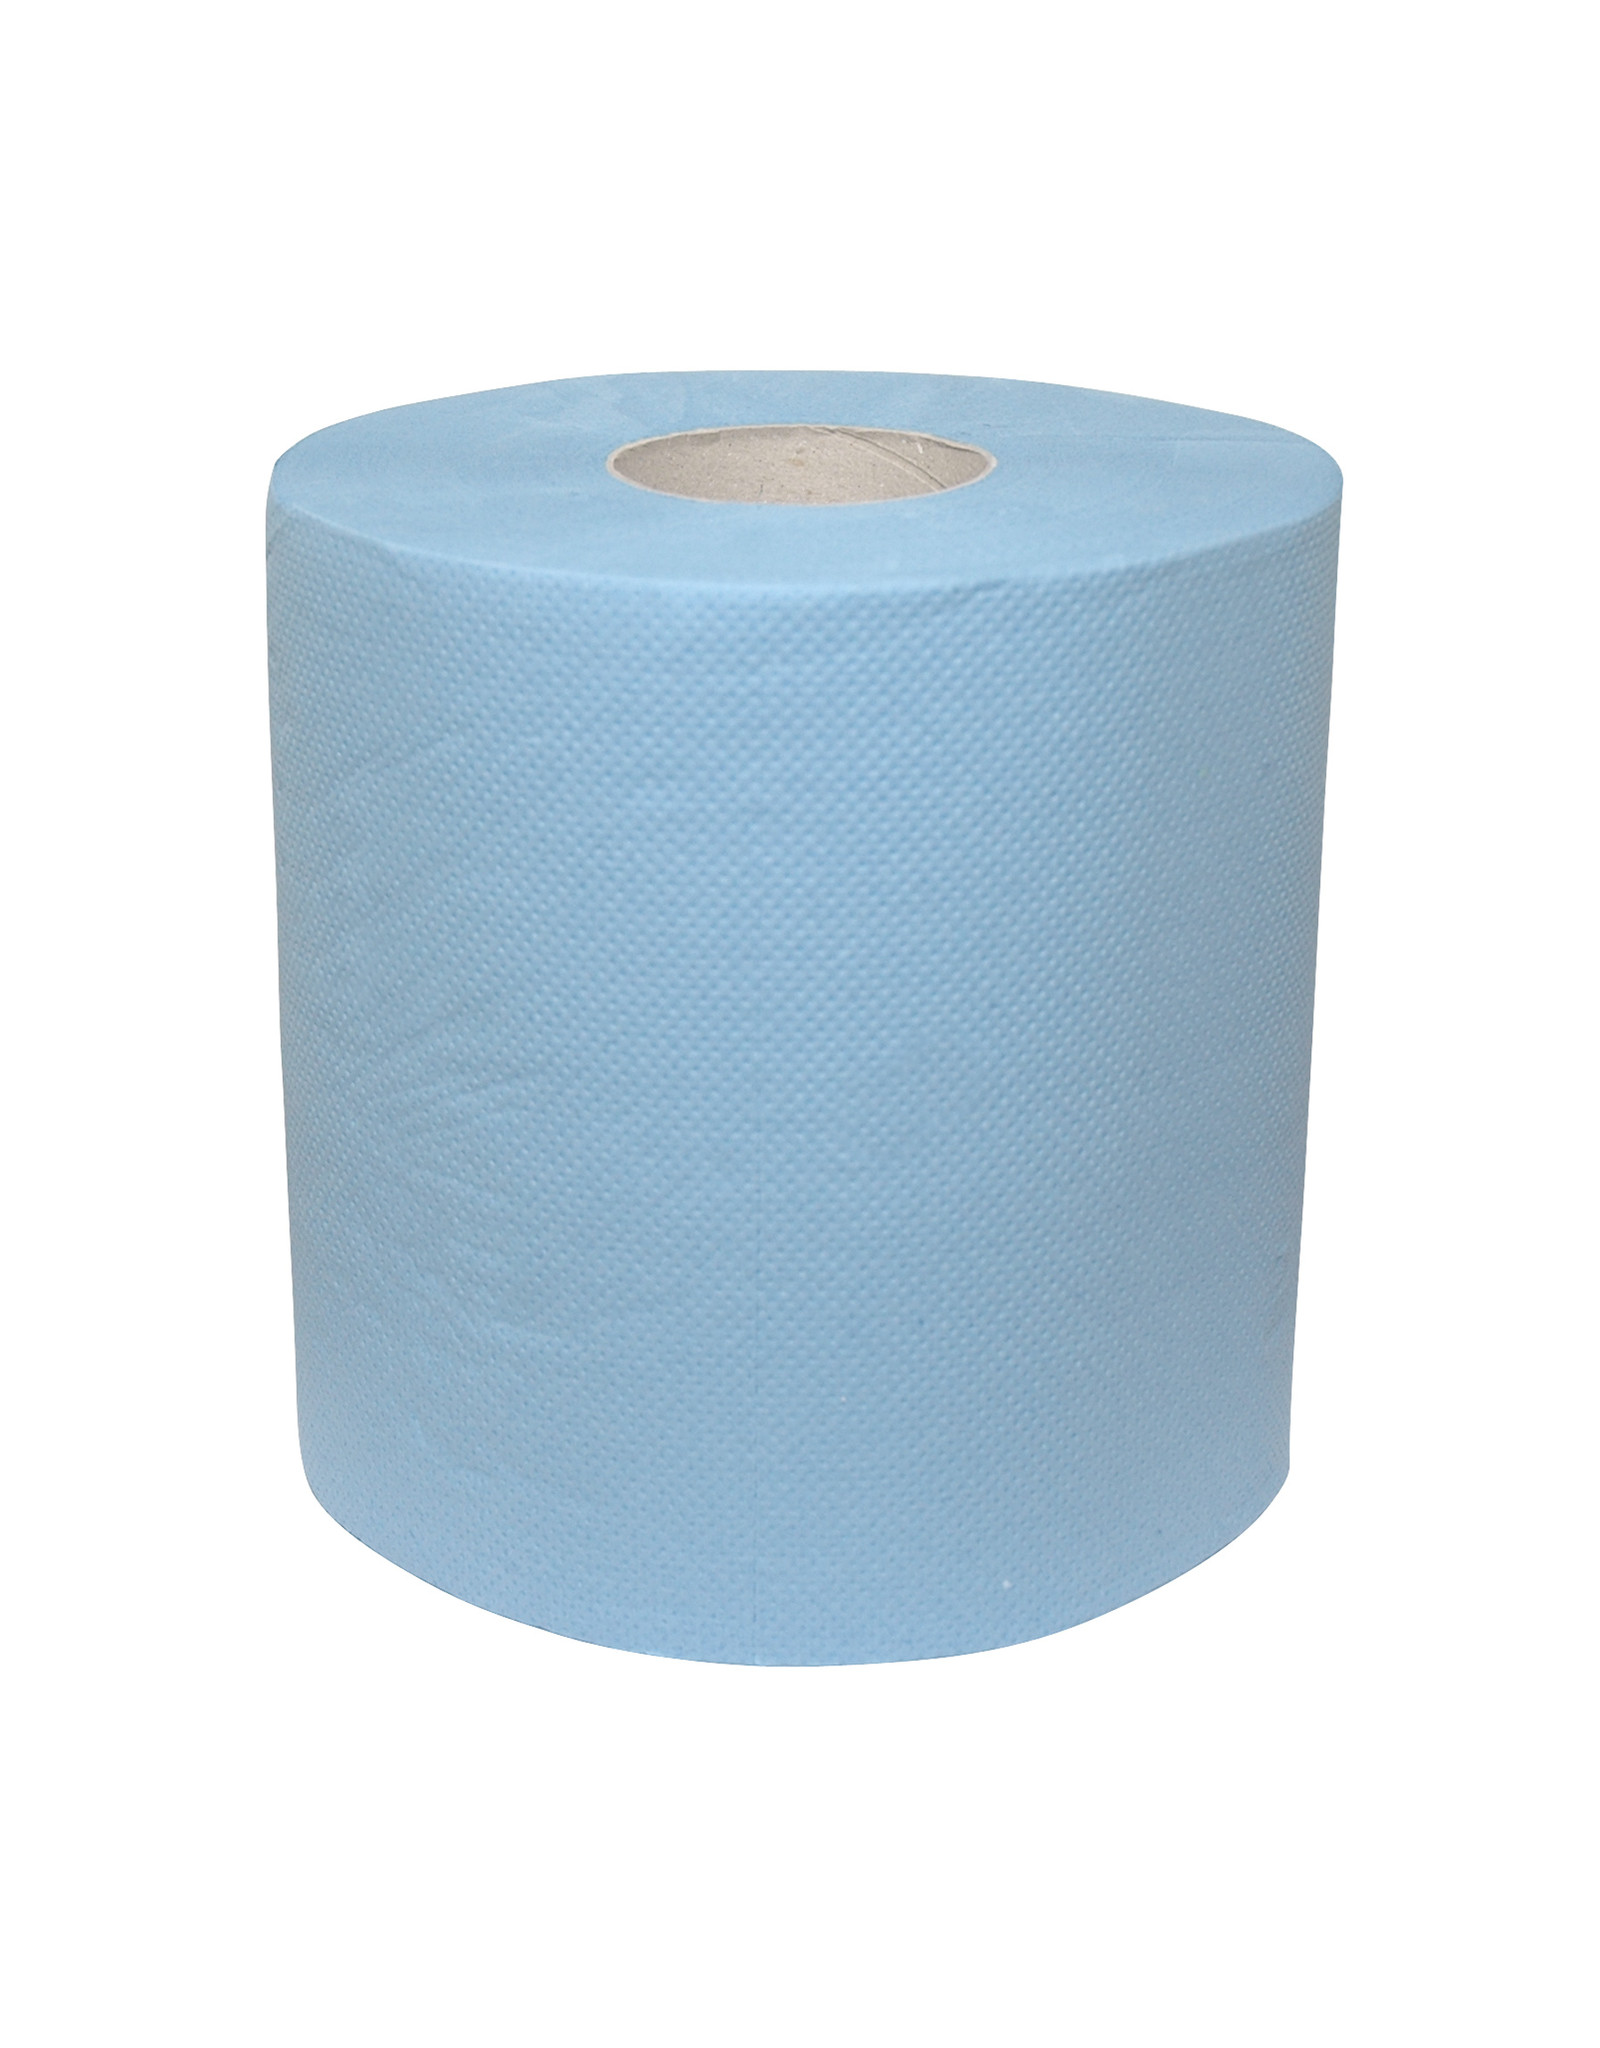 ACOR Midi rol 2-laags cellulose blauw verlijmd 6 x 150 meter.